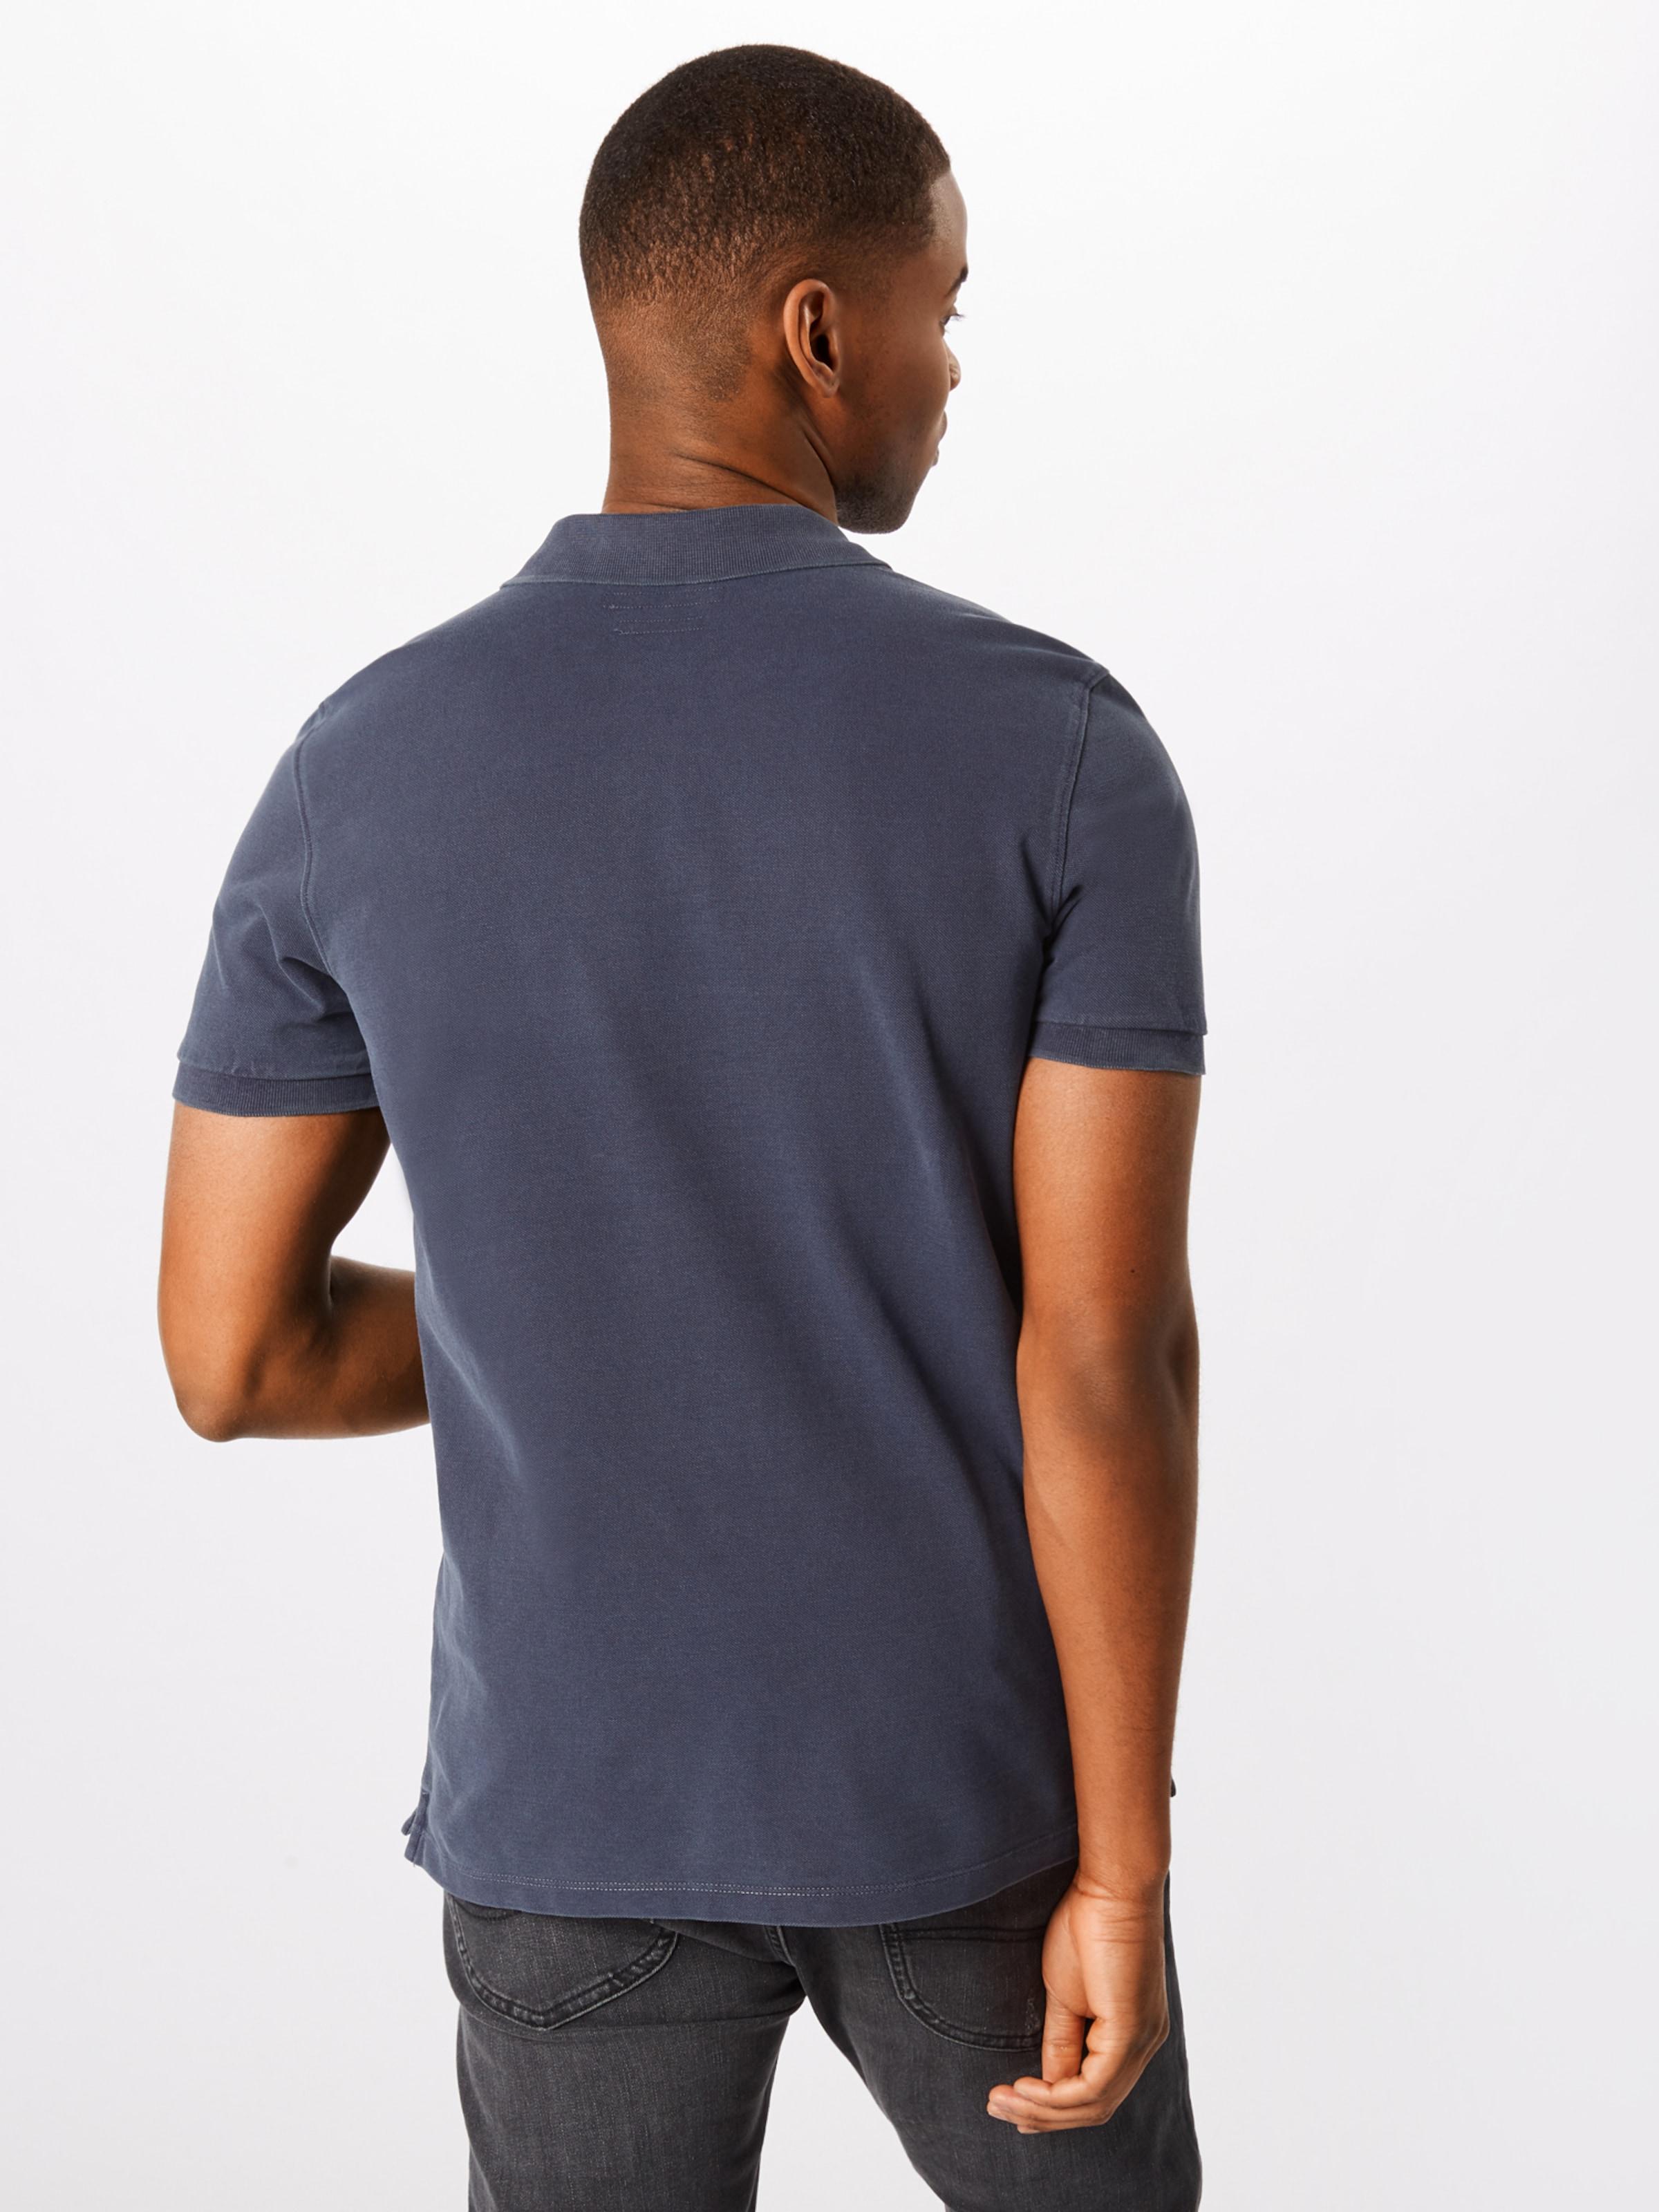 O'polo shirt Graphite T Marc En kZuwXPTOi